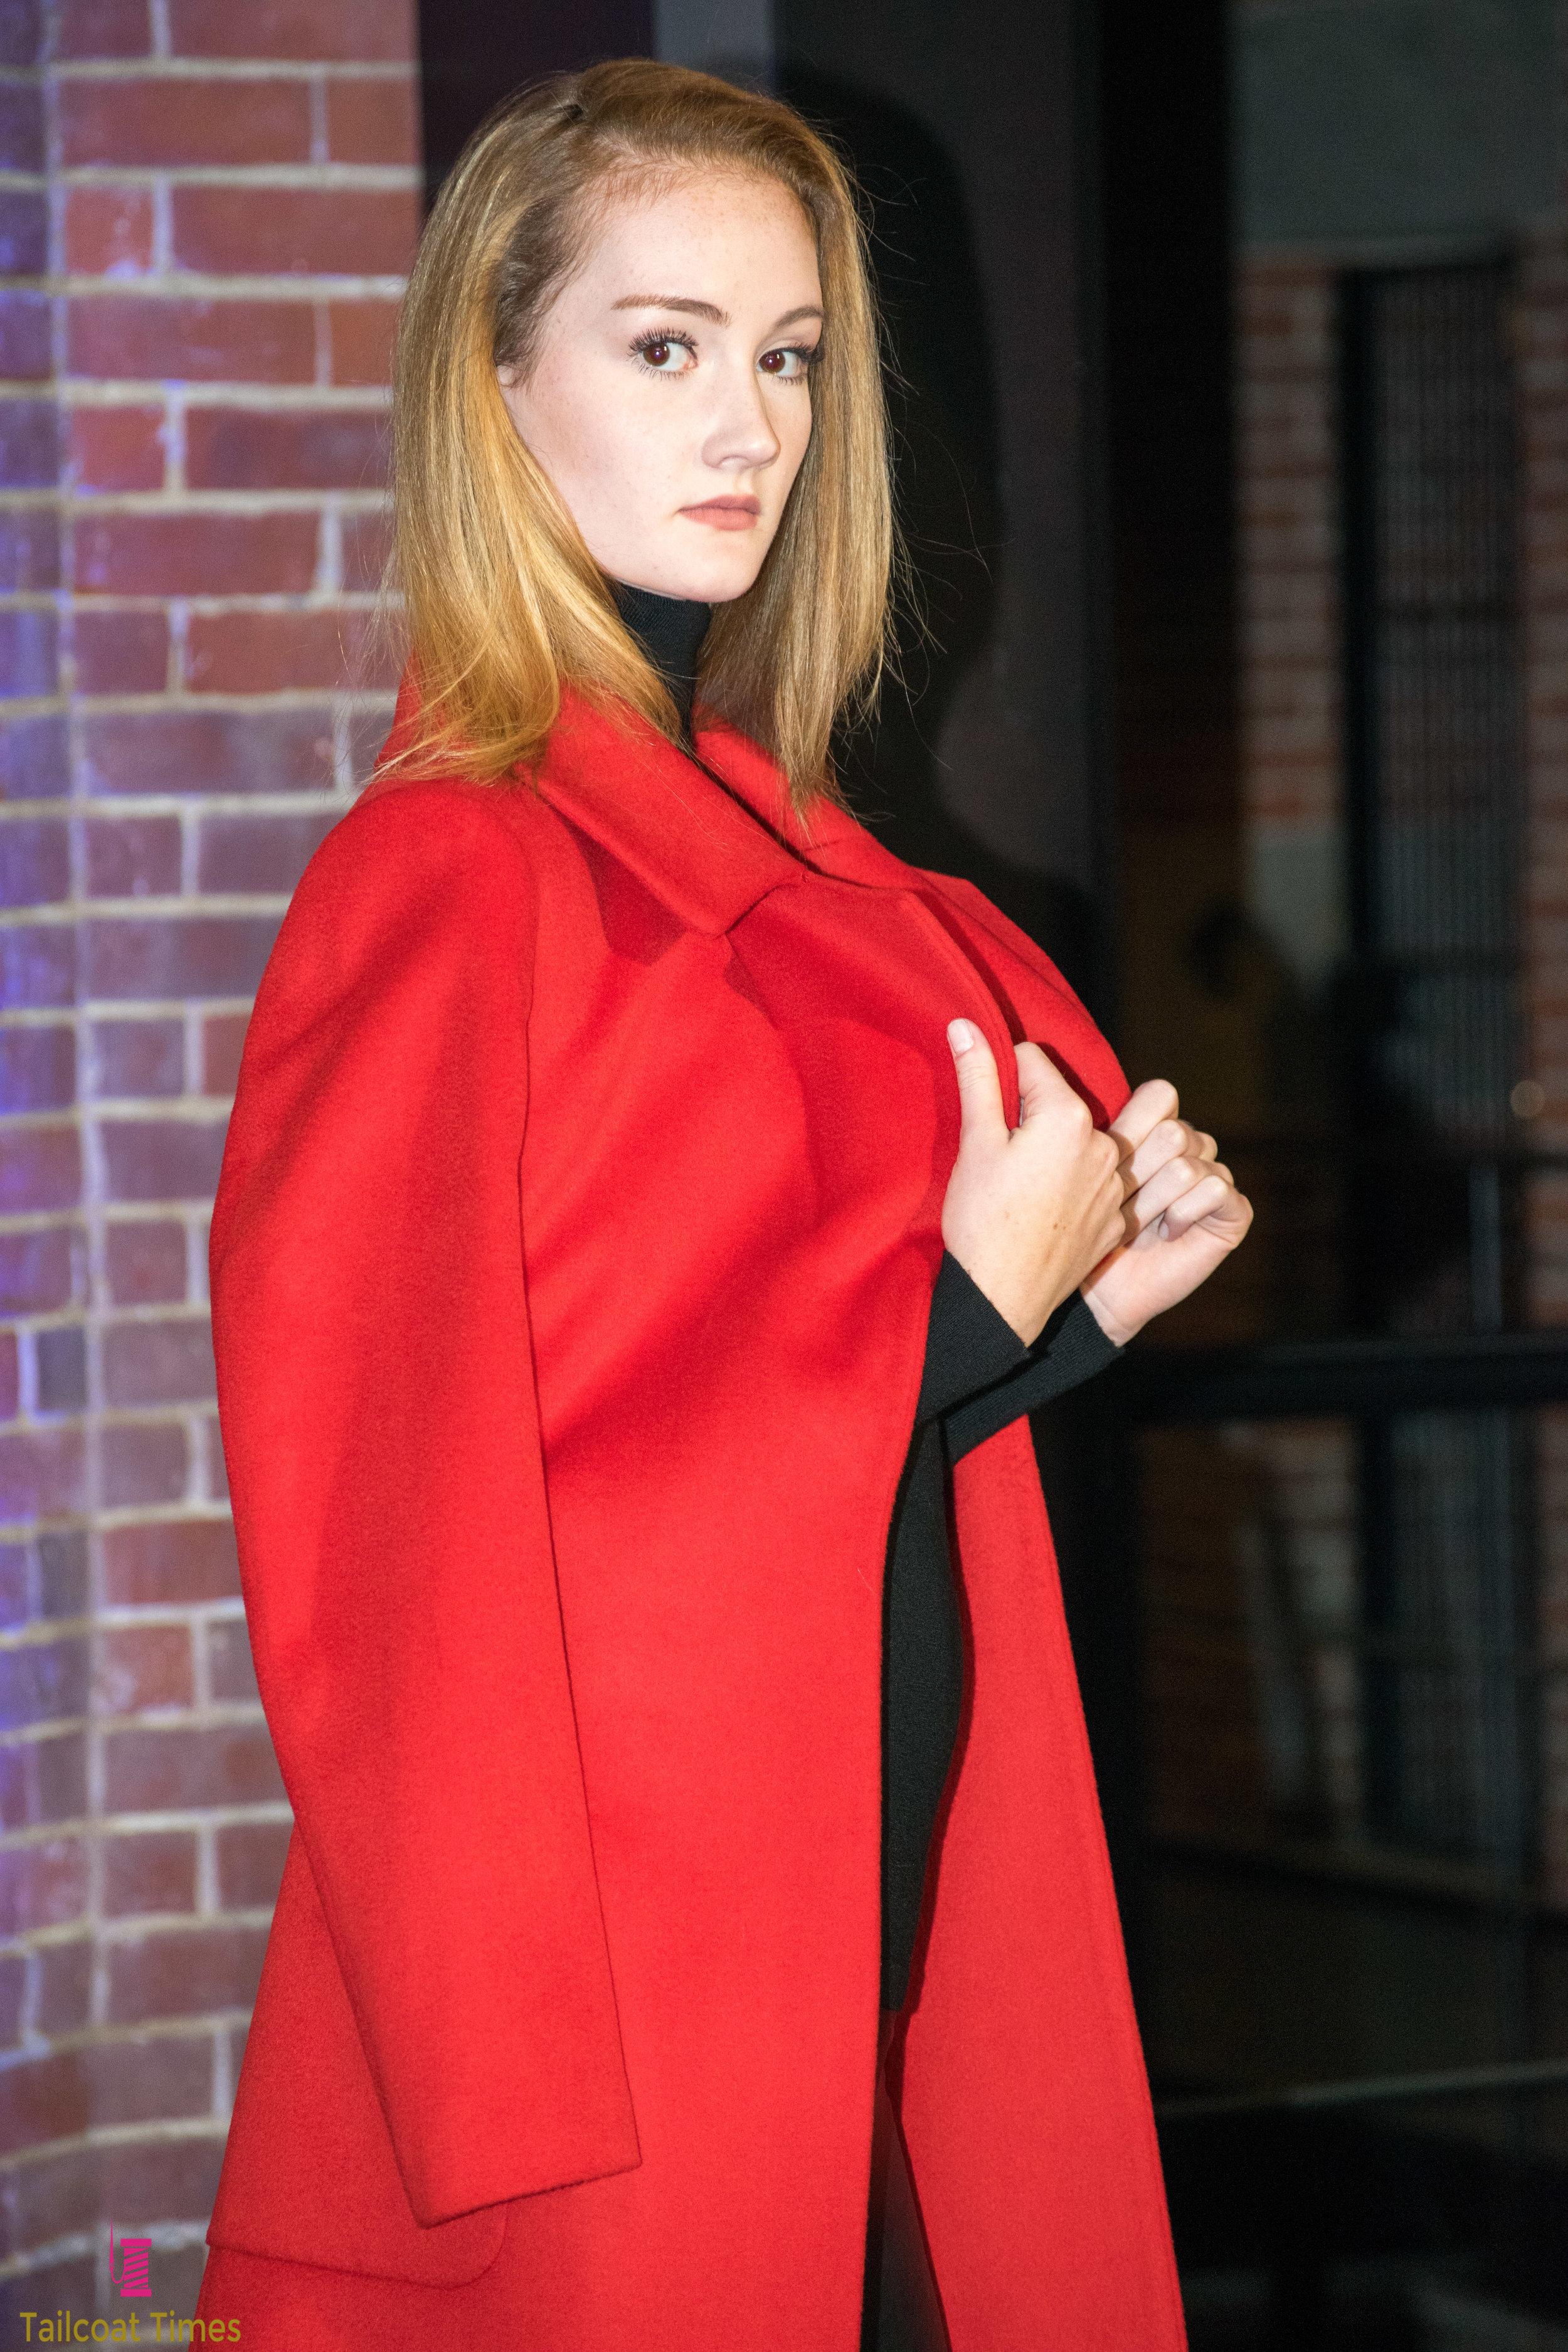 FashionablyLate-REISS-Tailcoat Times-9.jpg